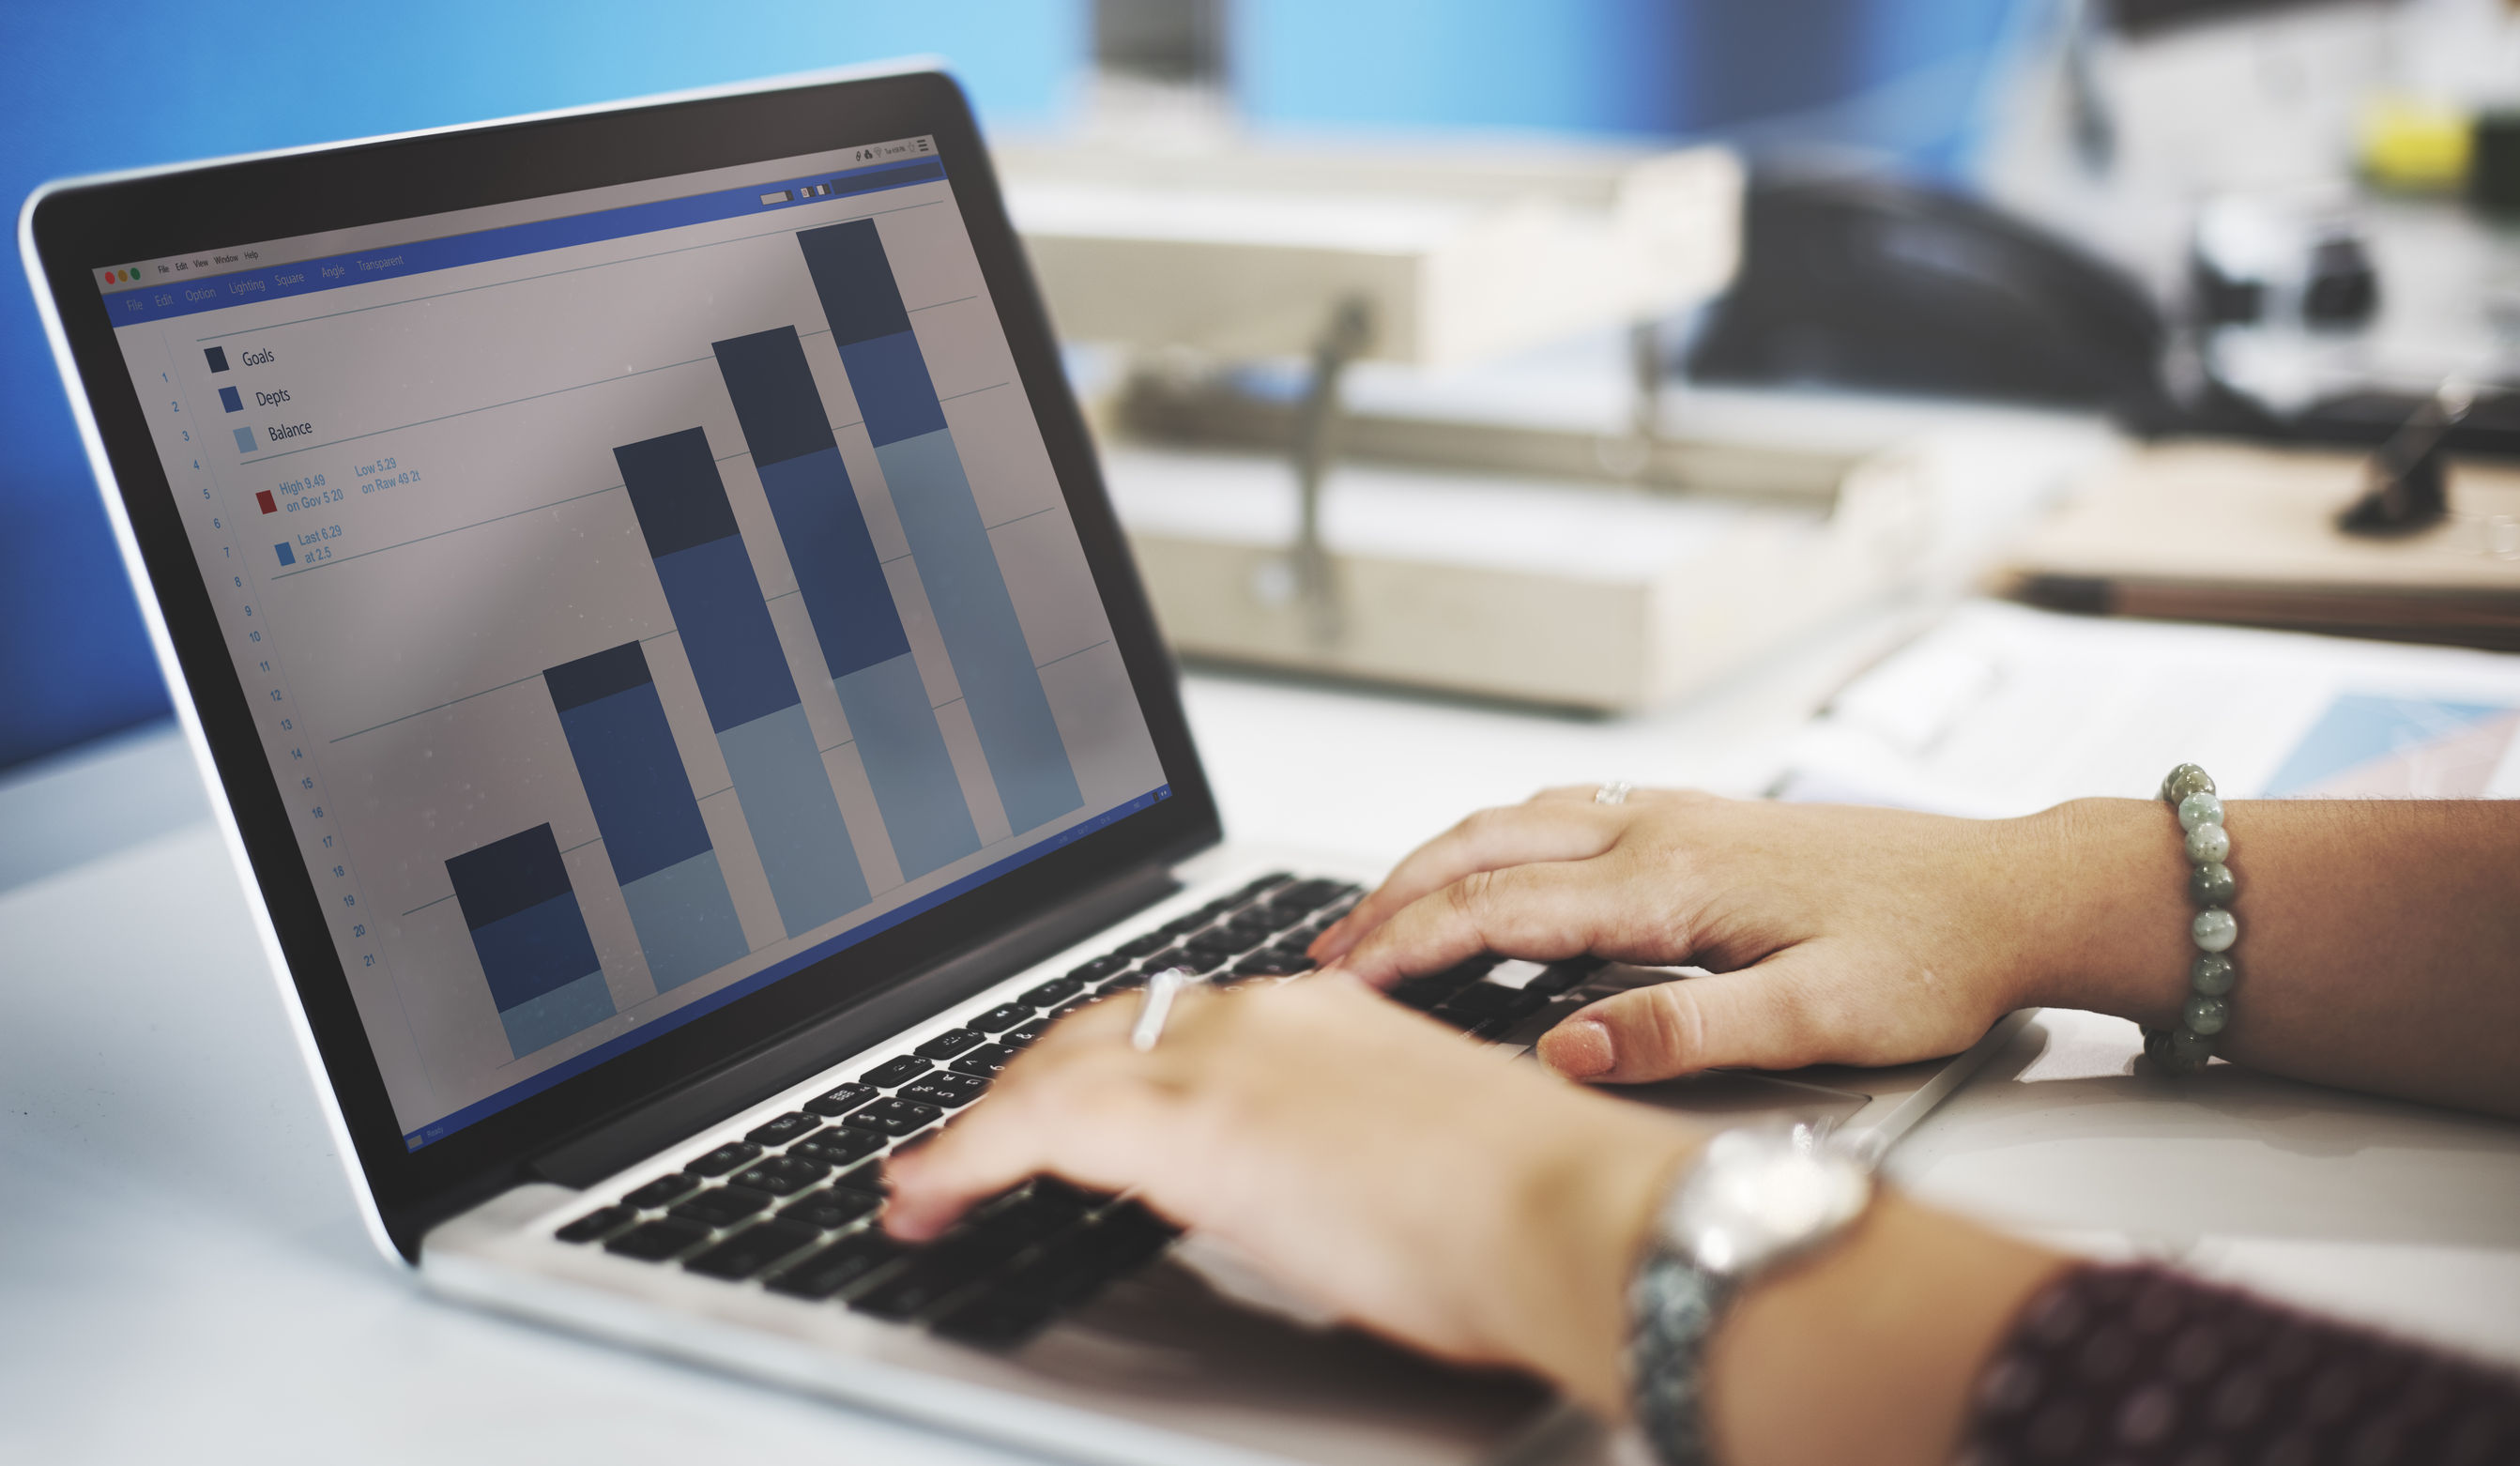 3 steps to build your data science portfolio